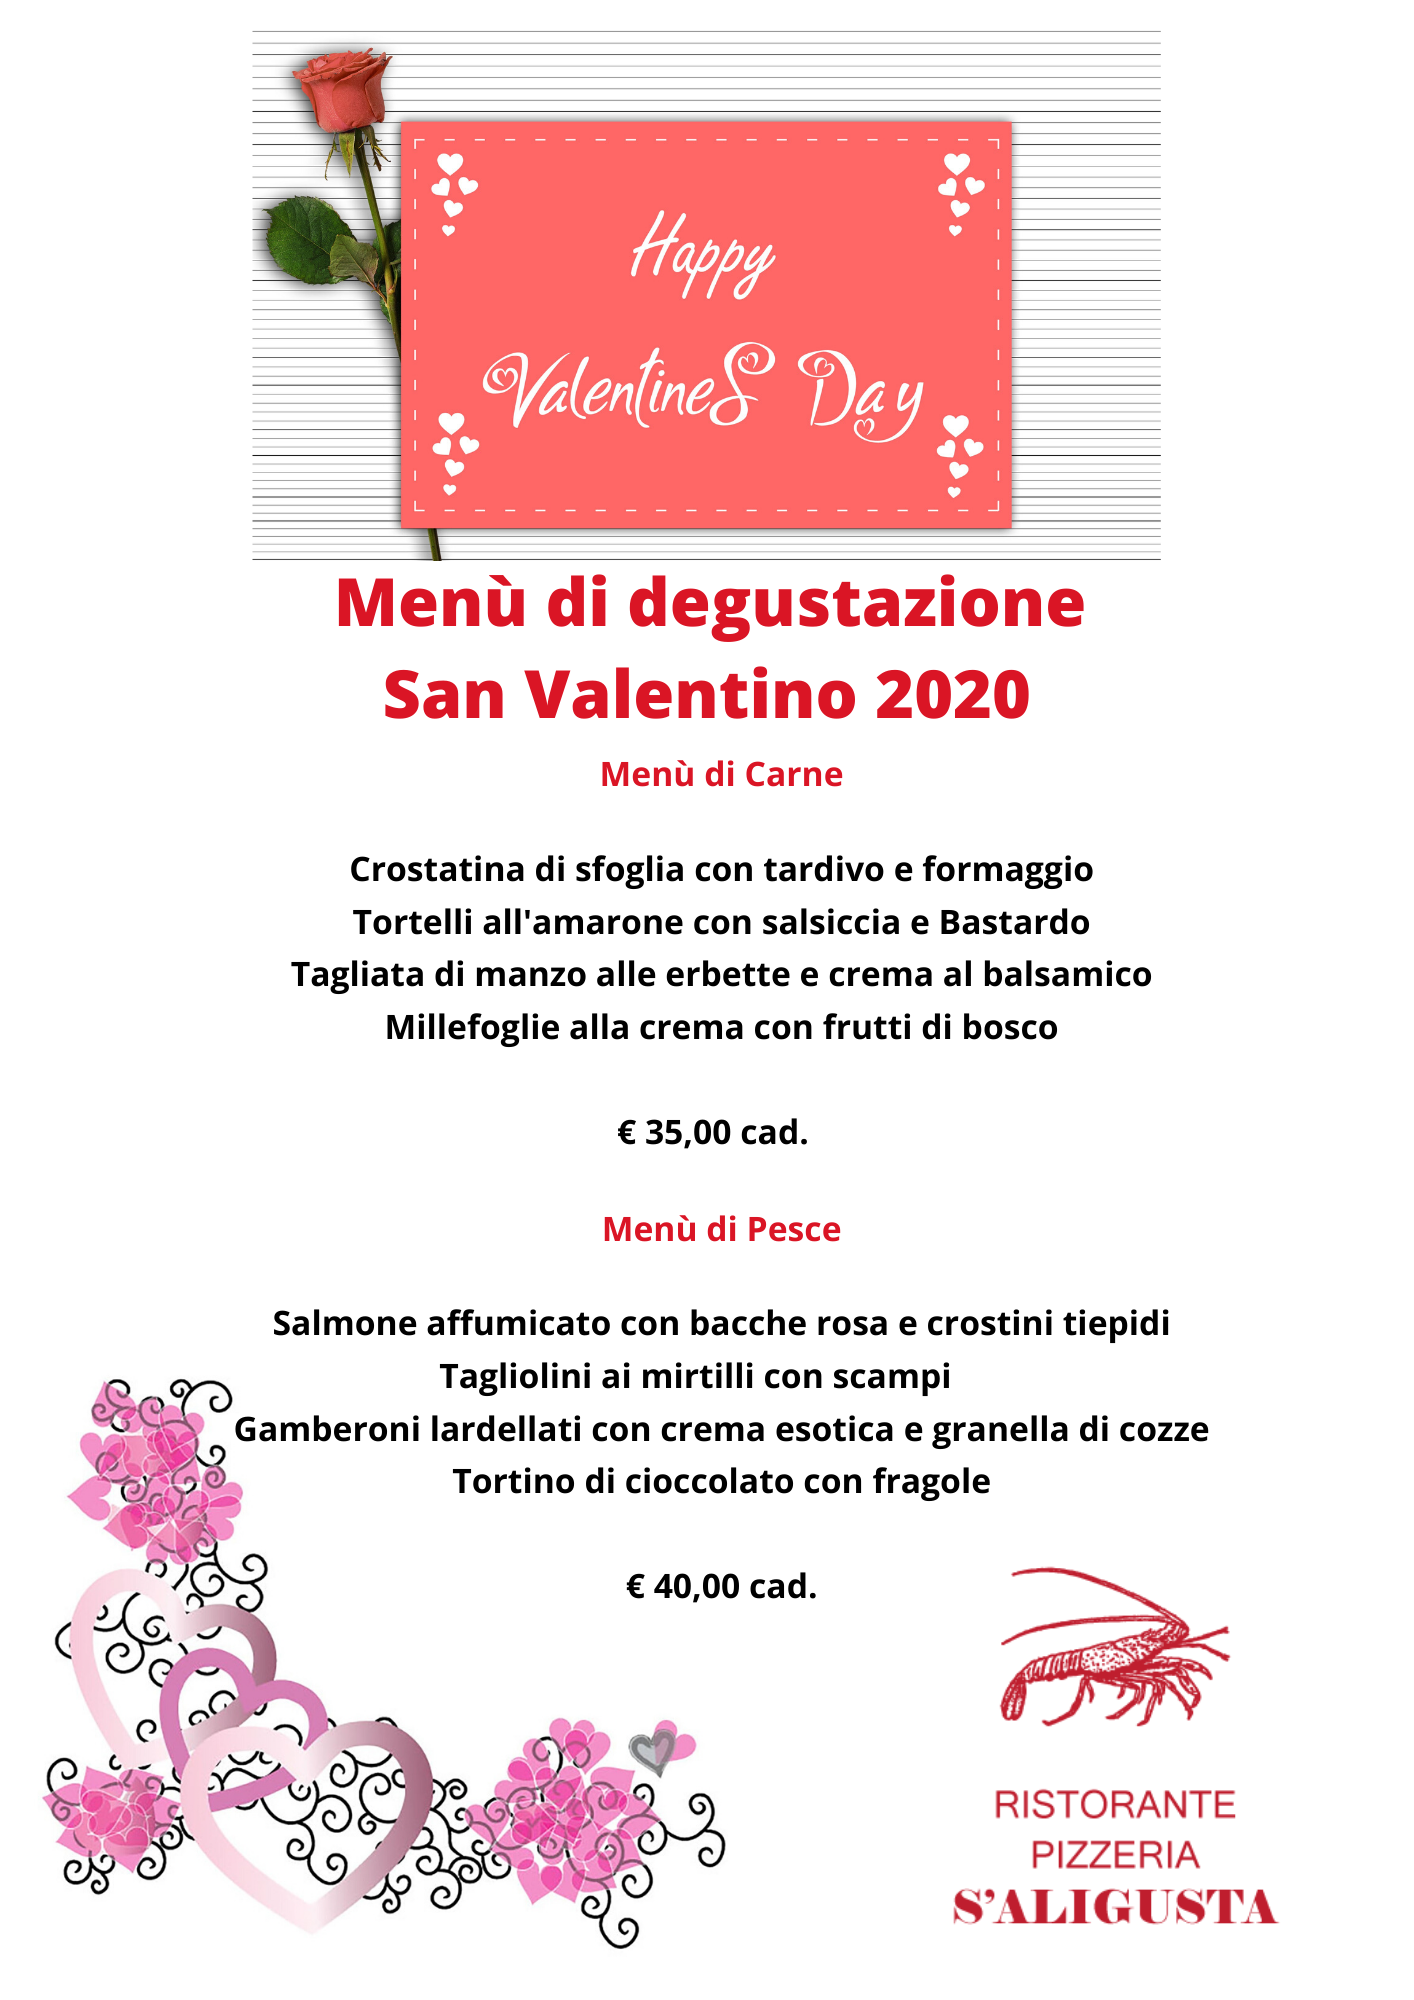 menu-degustazione-san-valentino-2020